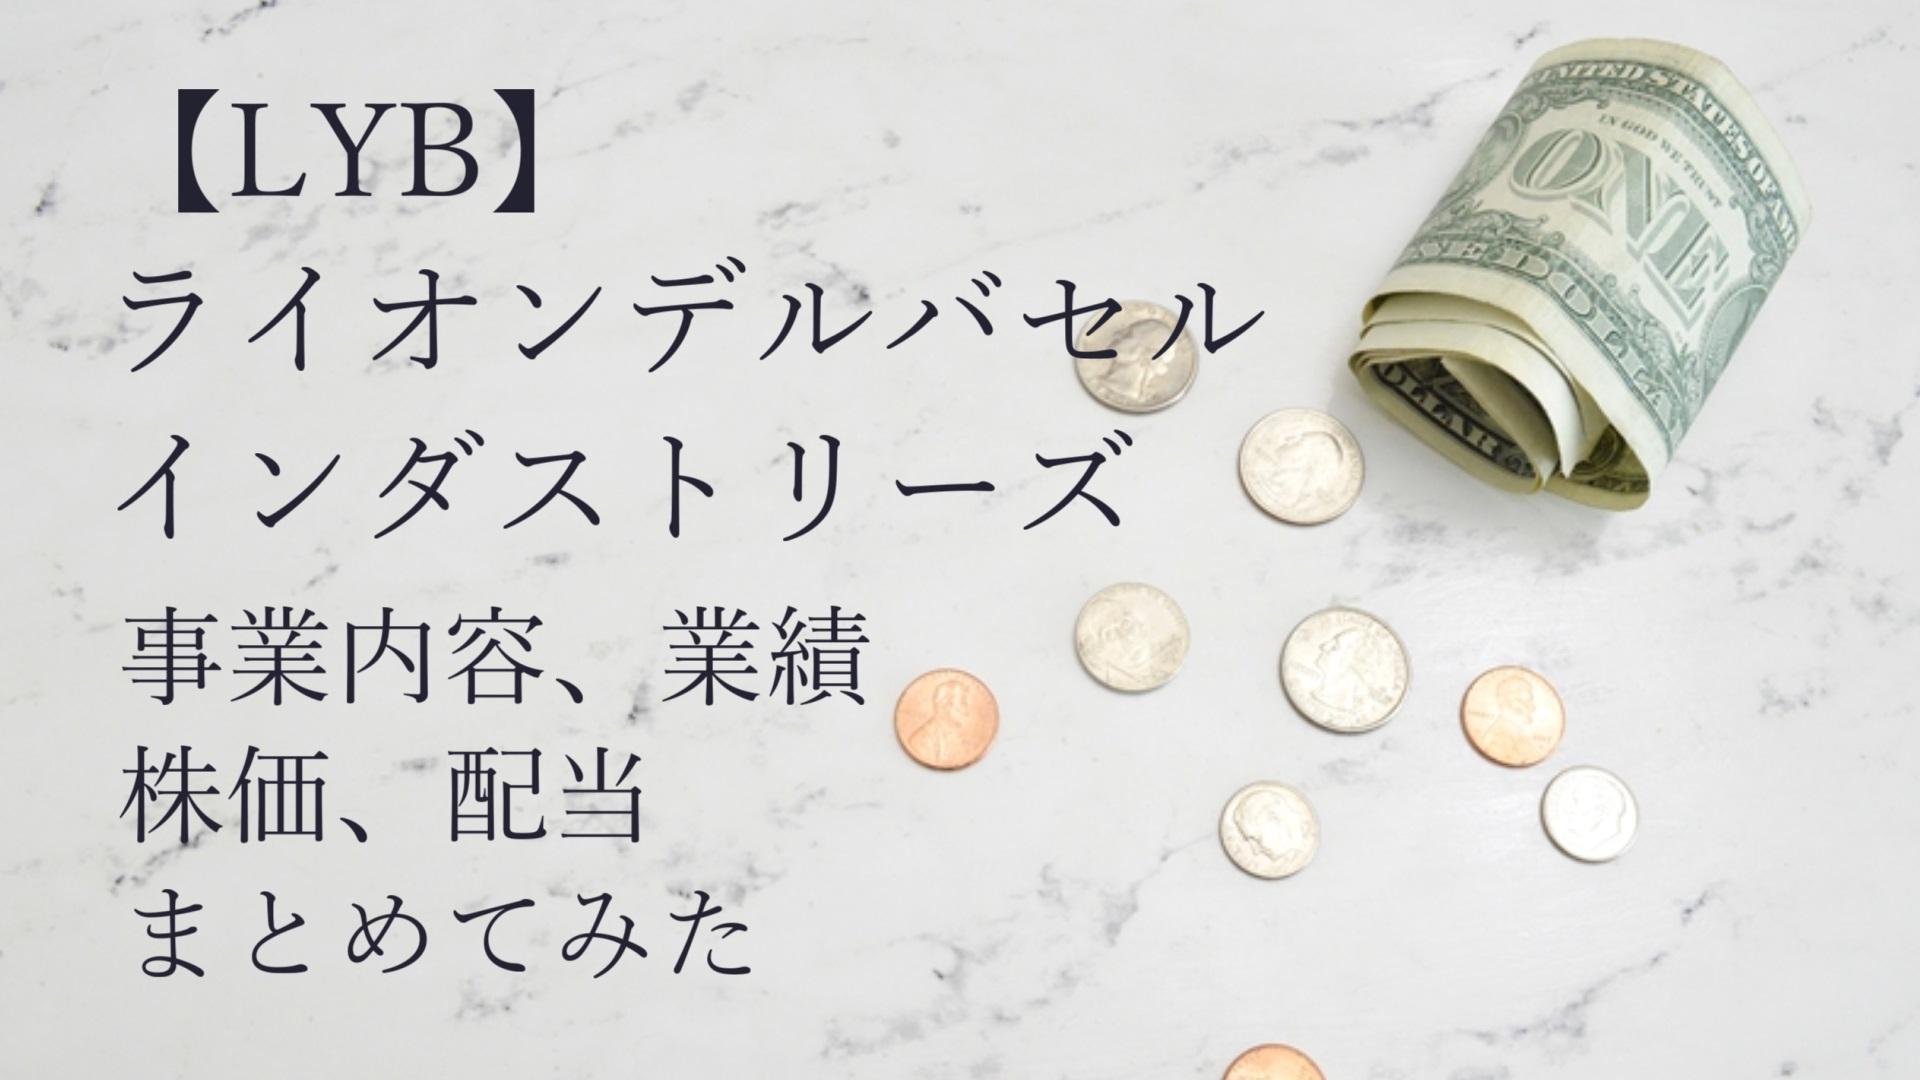 【LYB】ライオンデルバセル・インダストリーズの事業内容、業績、株価、配当などの銘柄紹介